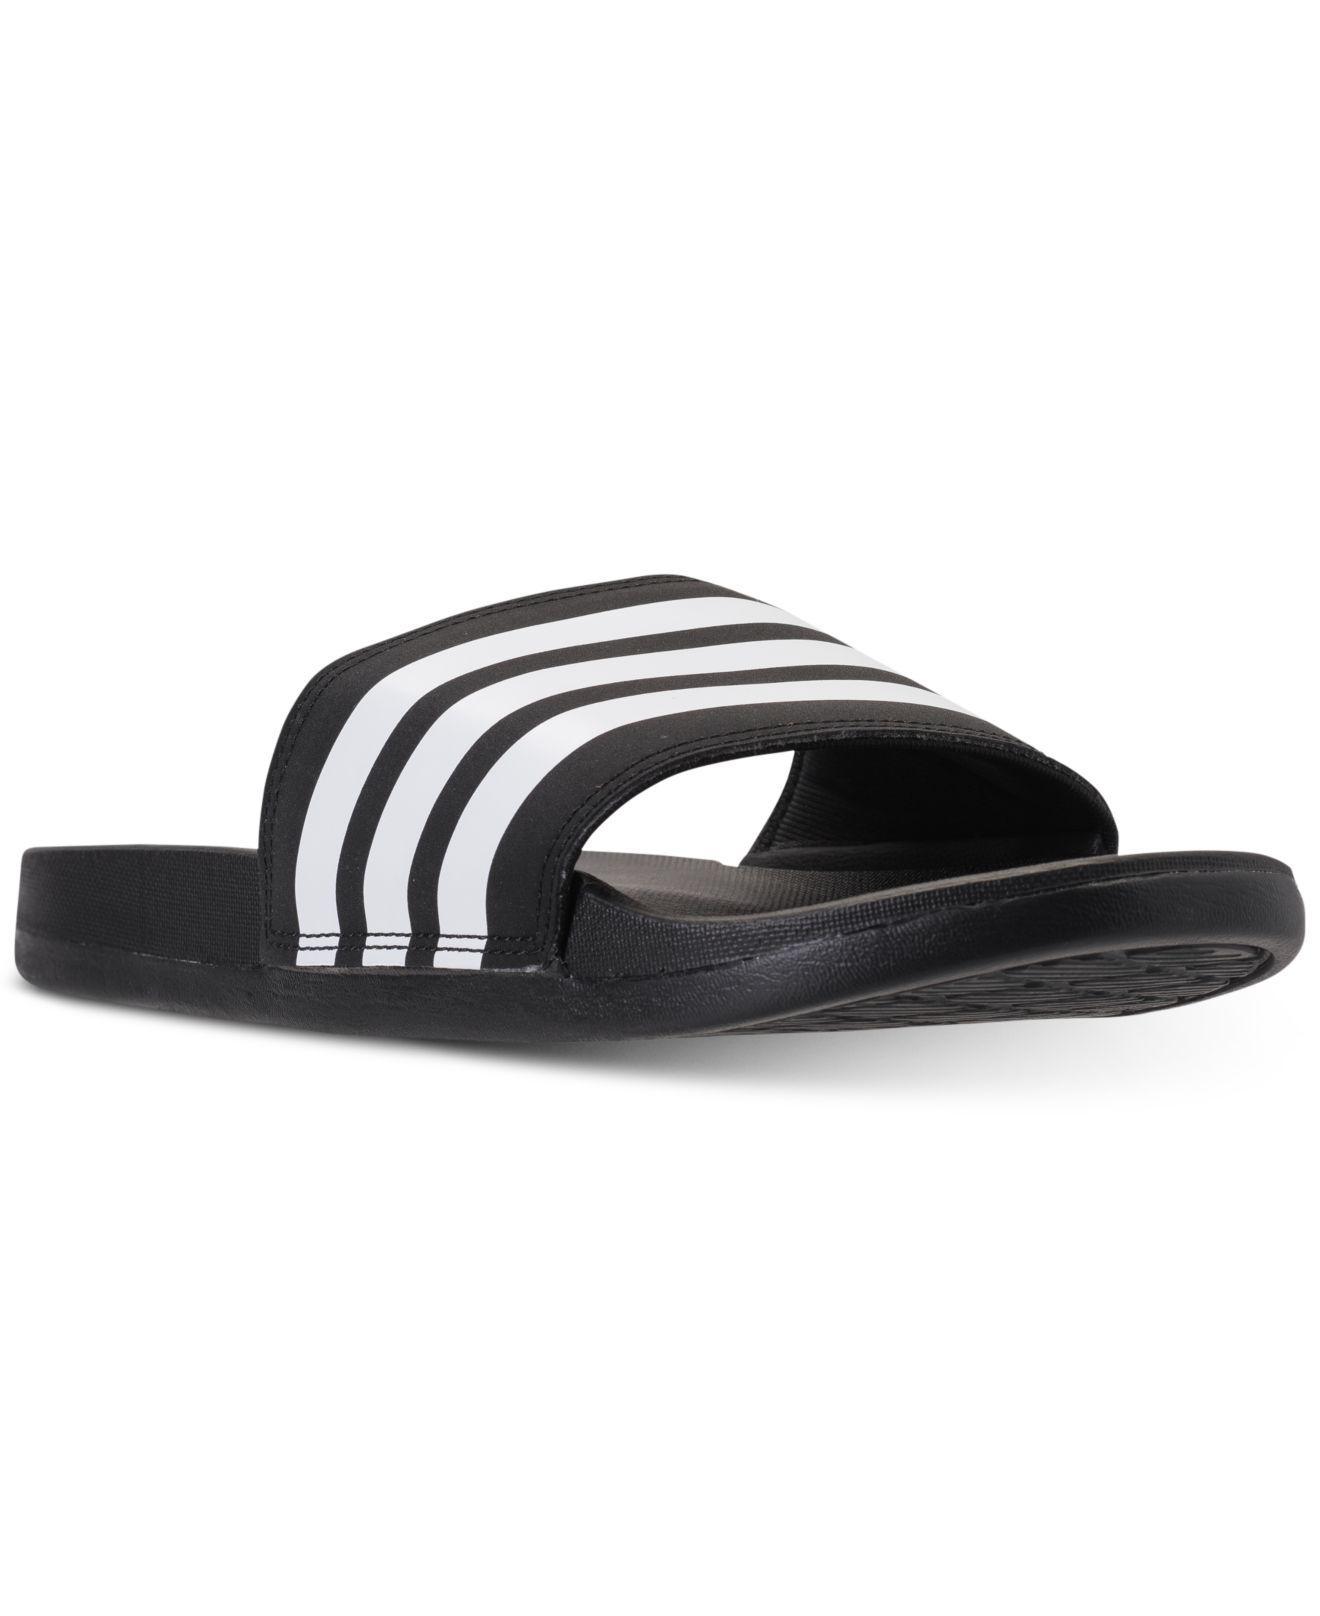 06a631330 Lyst - adidas Adilette Cloudfoam Plus Stripes Slides in Black - Save 45%